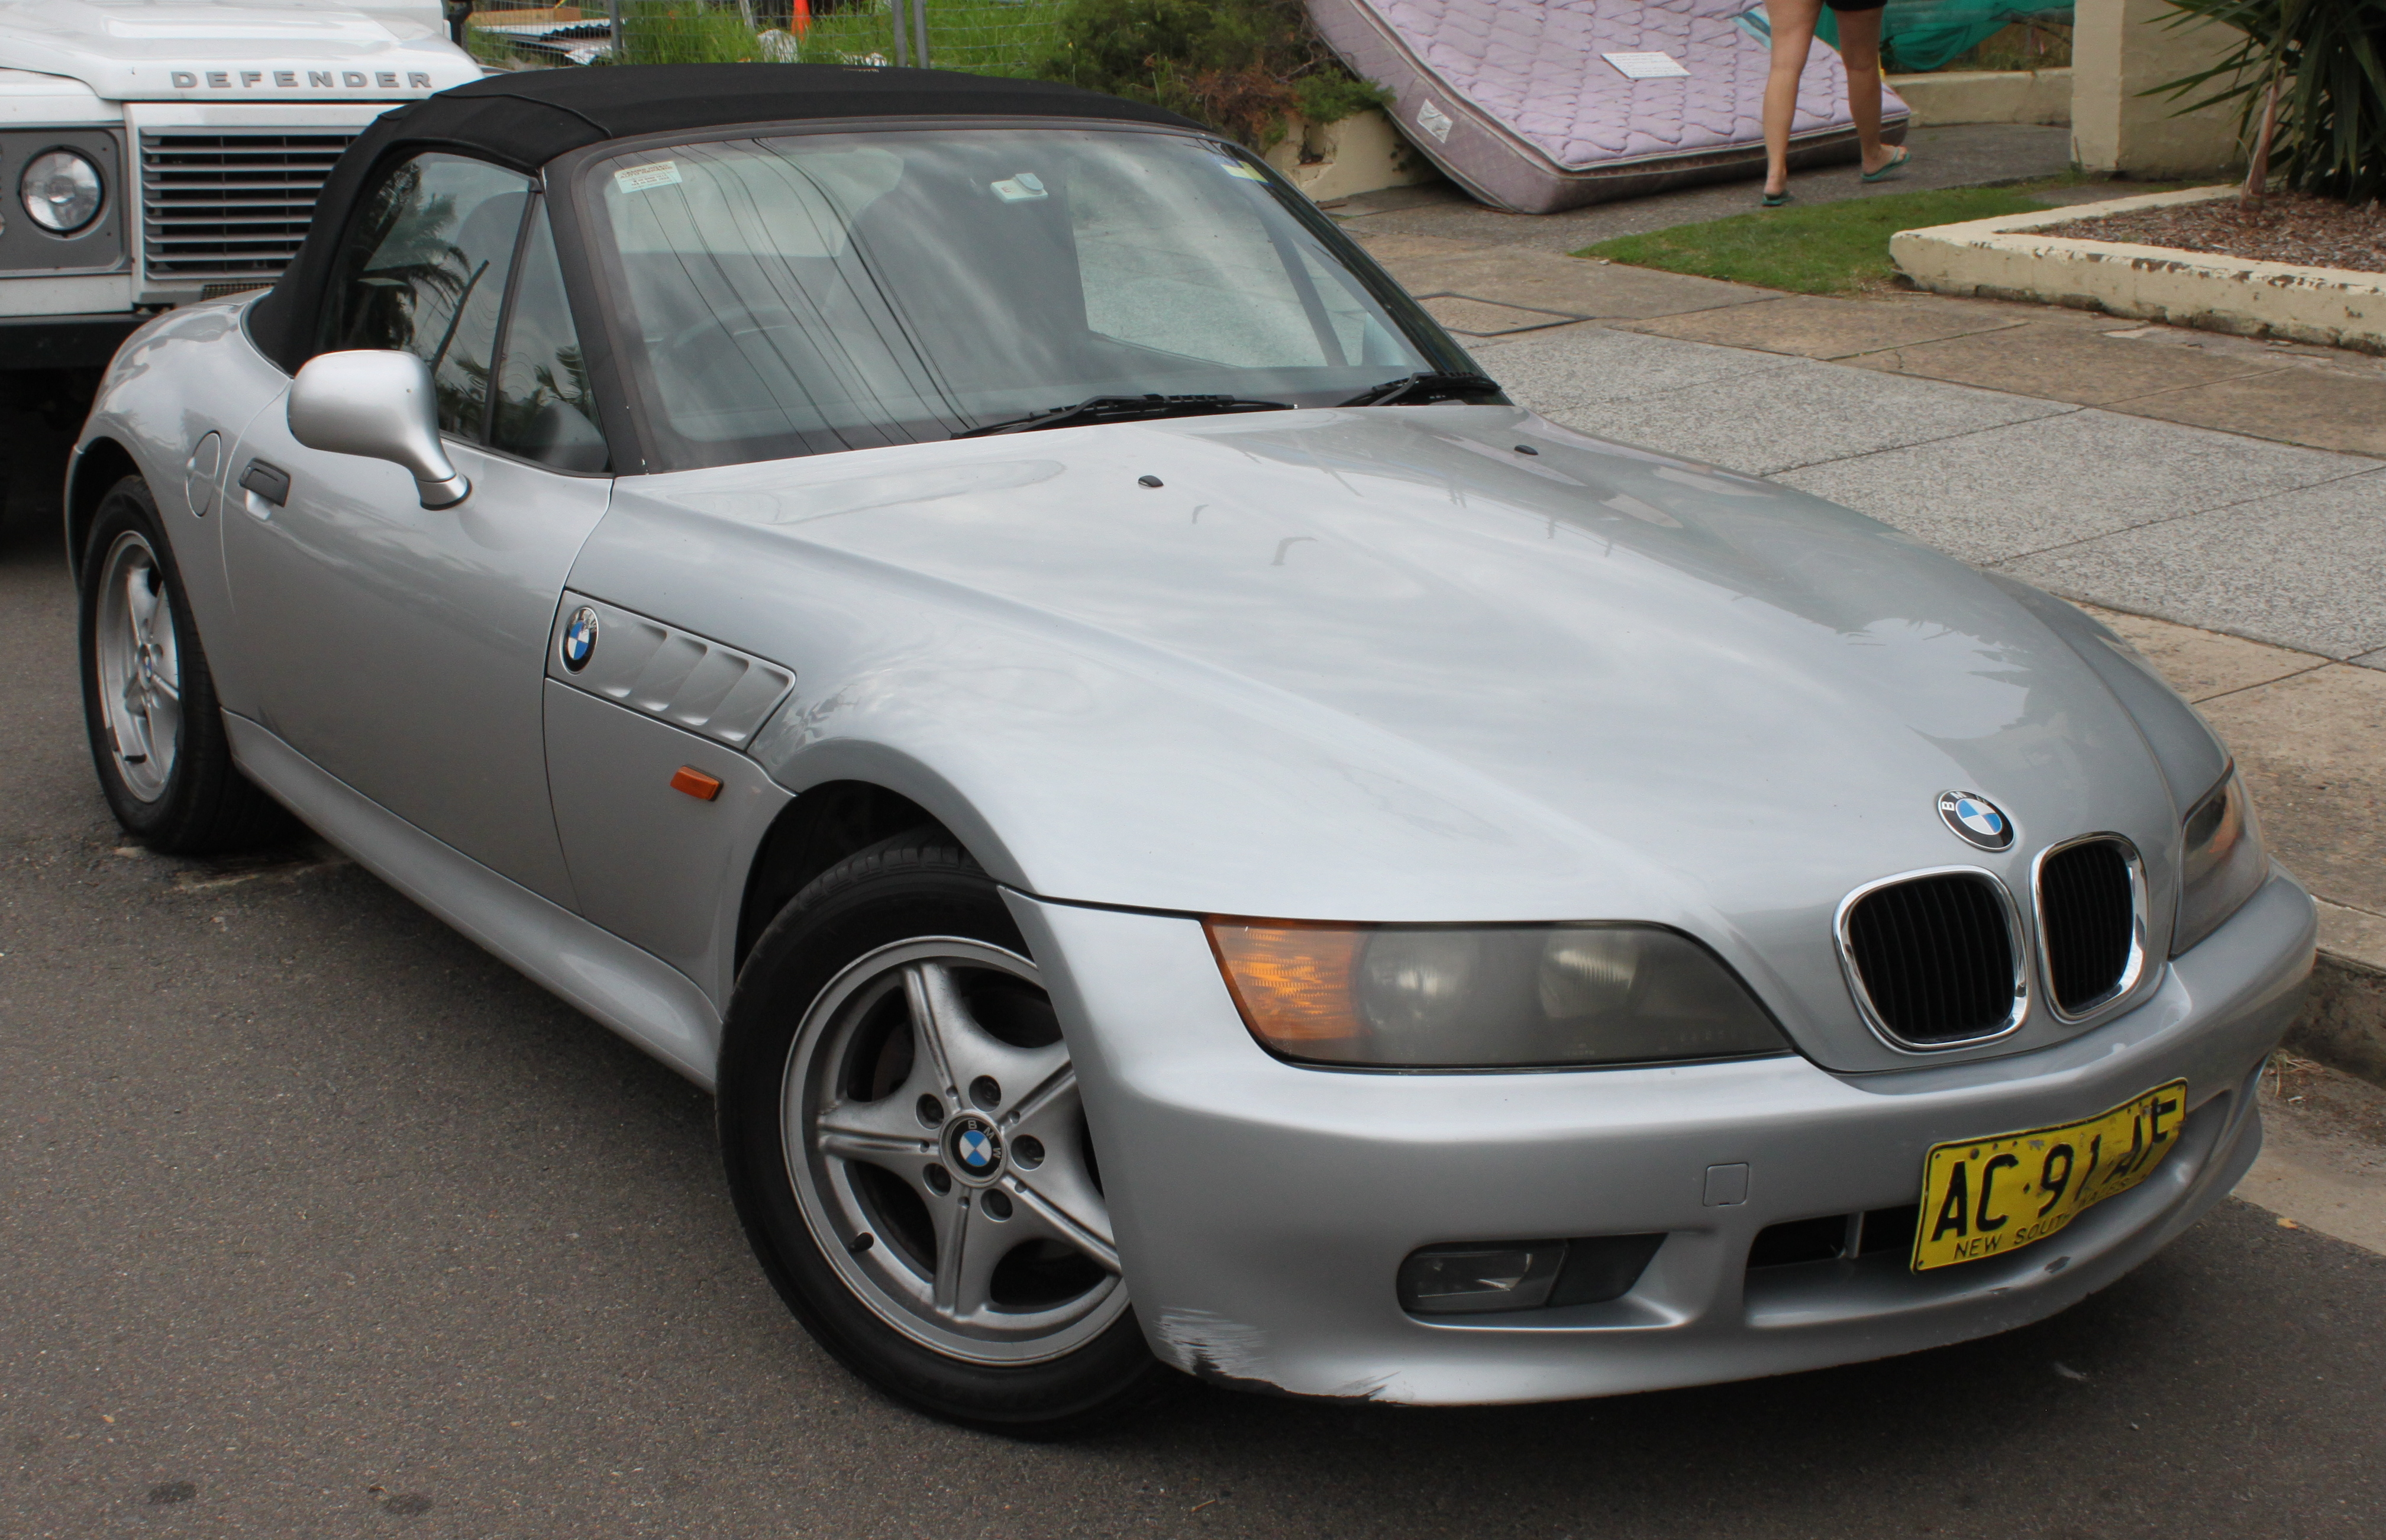 Bmw Z3 Coupe E36 7 2 8 192 Hp